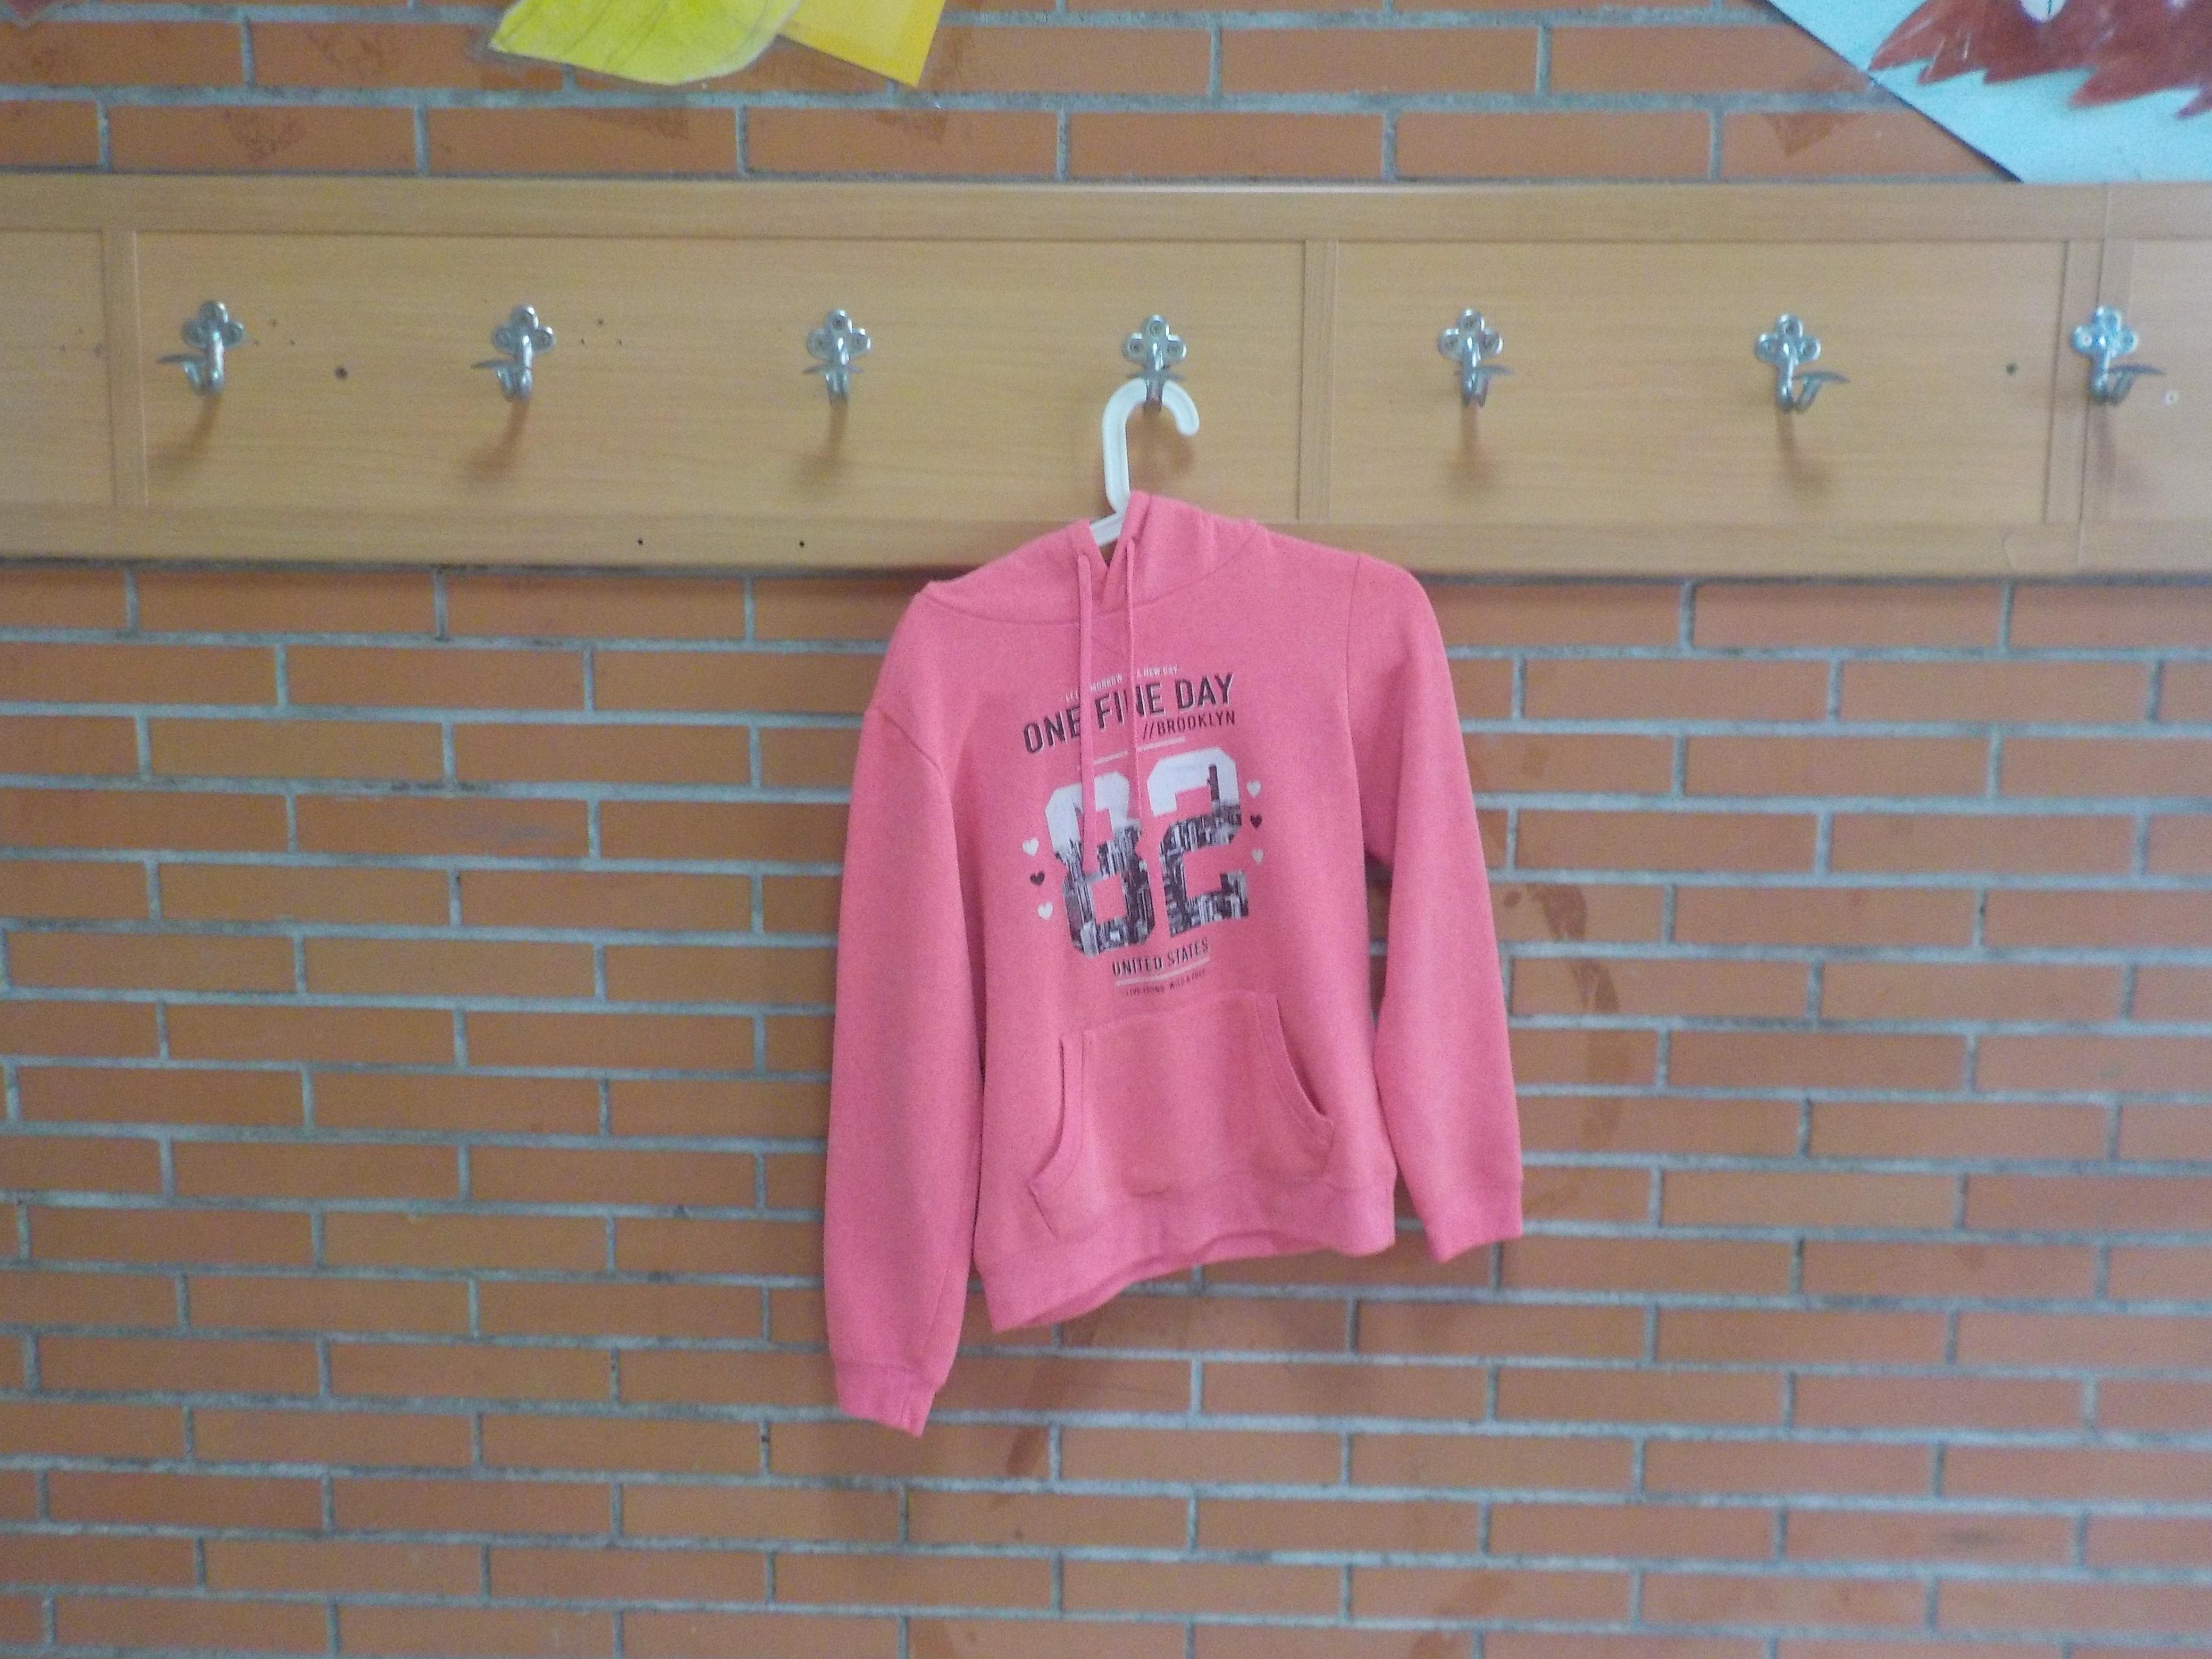 Catalogo de ropa olvidada 2  2018 4